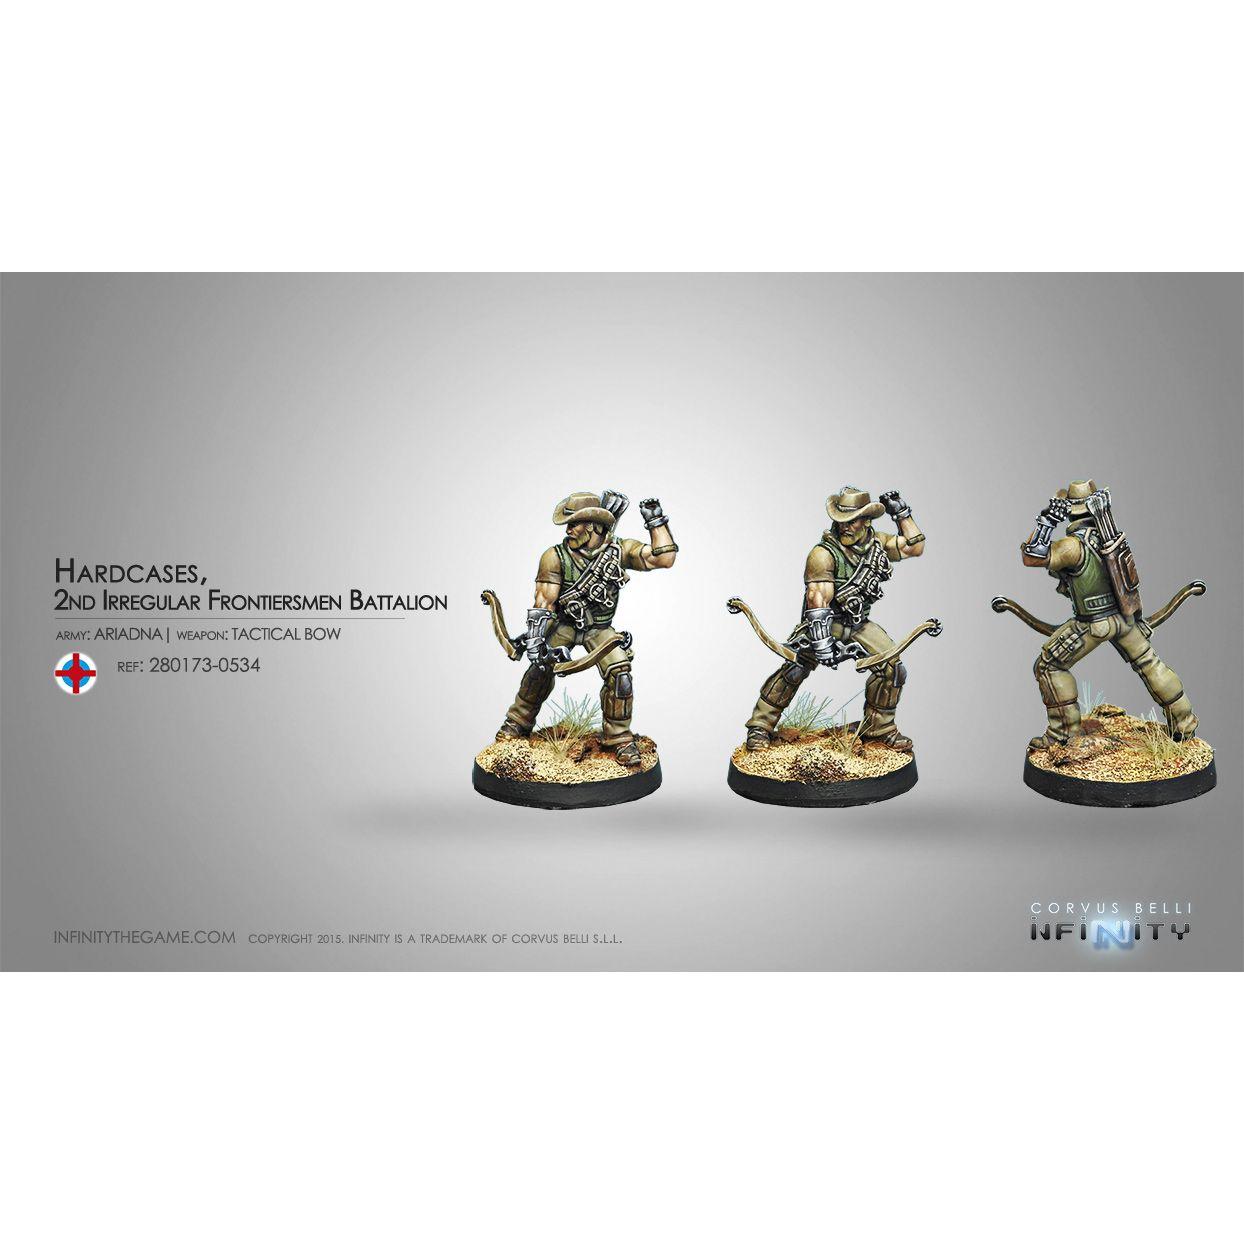 Hardcases, 2nd Irregular Frontiersmen Battalion (Tactical Bow)